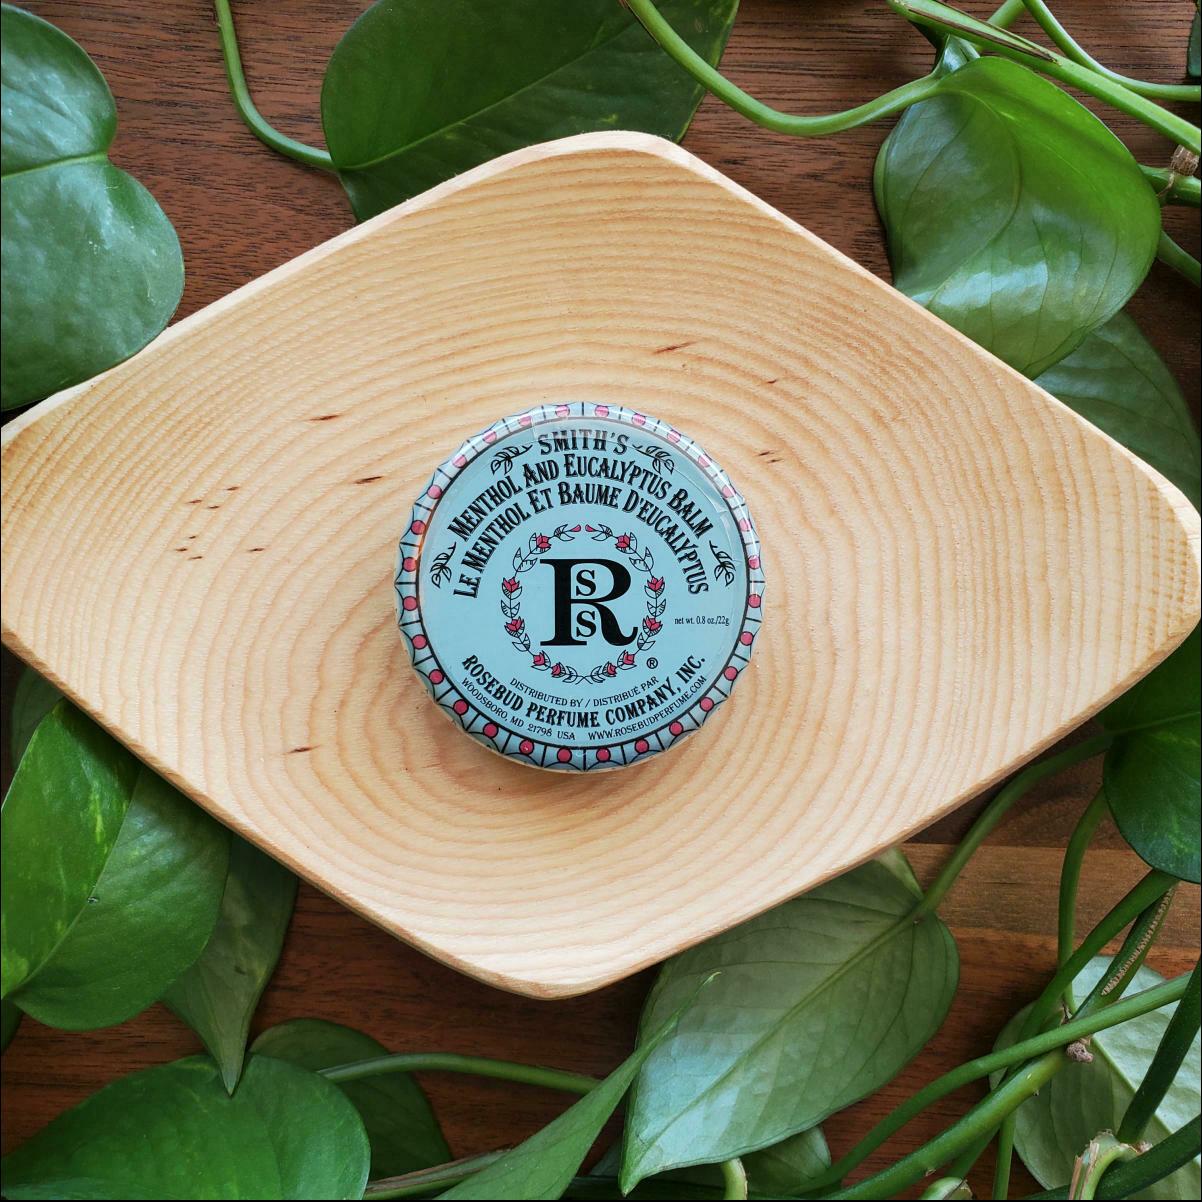 Rosebud Perfume Co. Smith's Menthol & Eucalyptus Balm